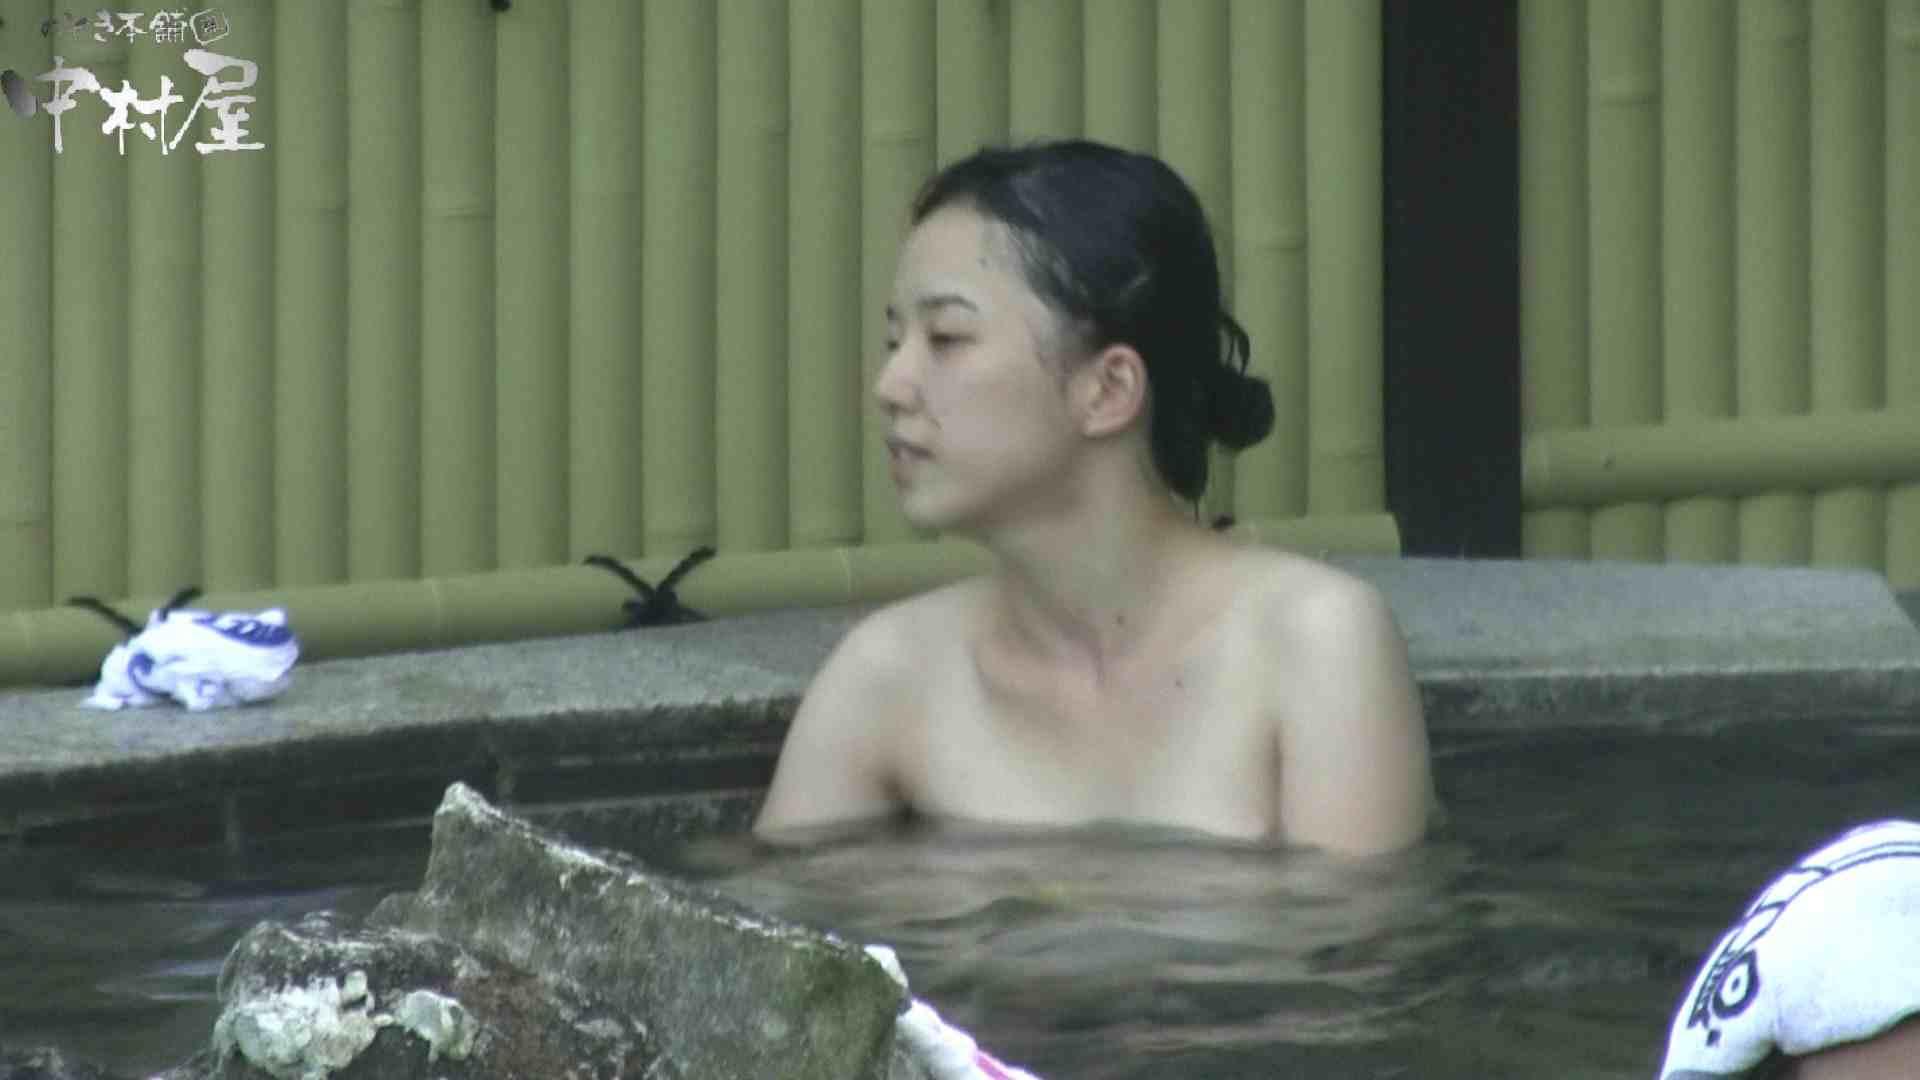 Aquaな露天風呂Vol.908 盗撮  30pic 10